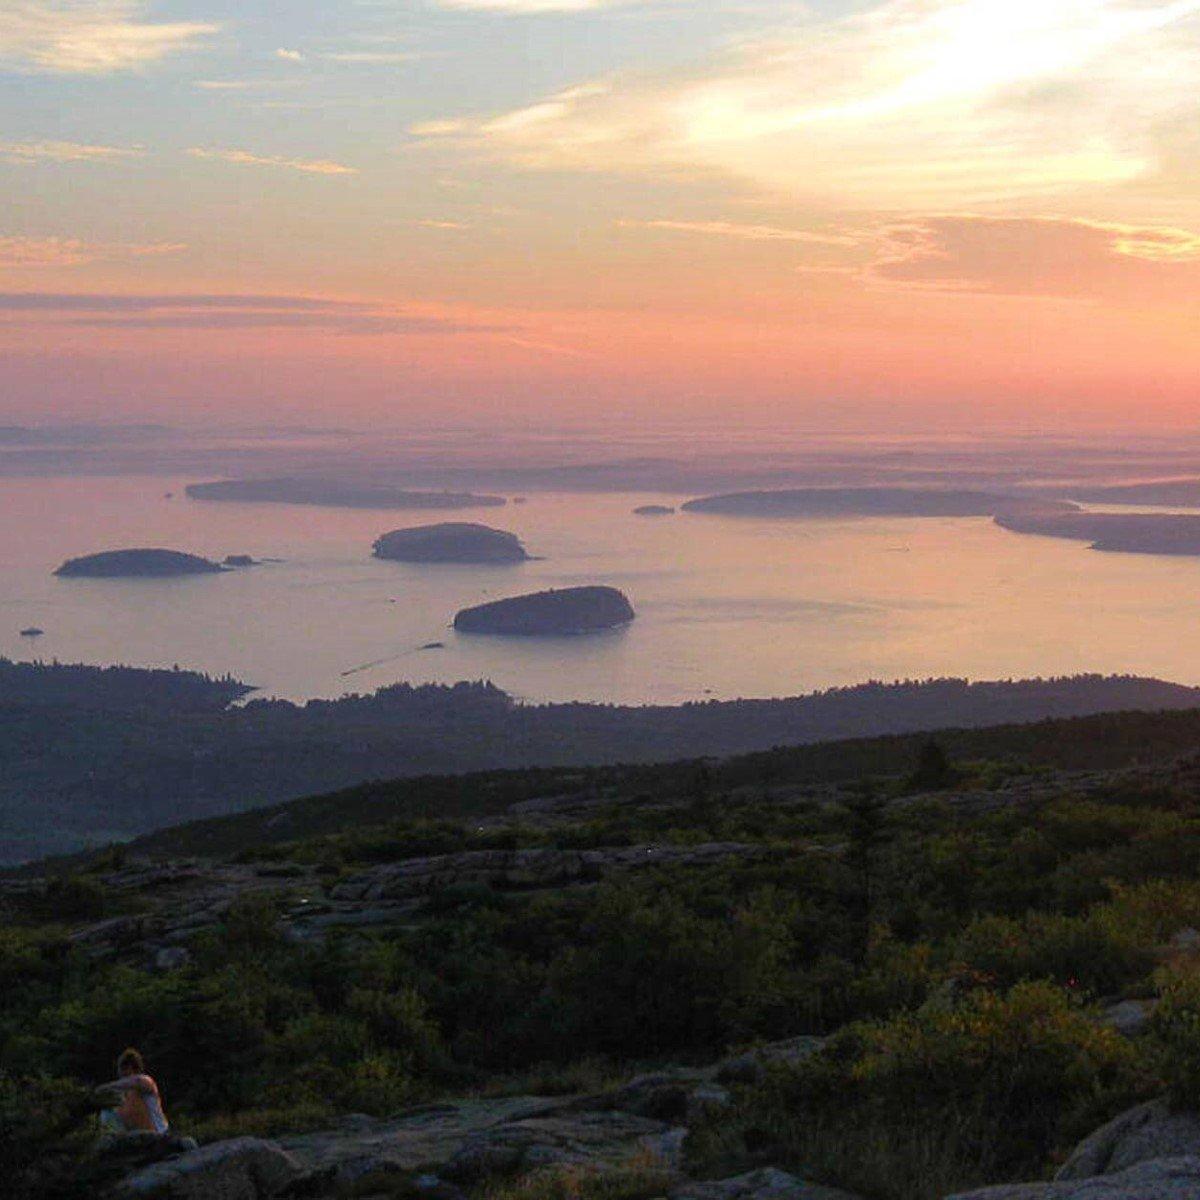 North Bay Cadillac >> Bar Harbor excursions - Sunrise tour to Cadillac Mountain ...